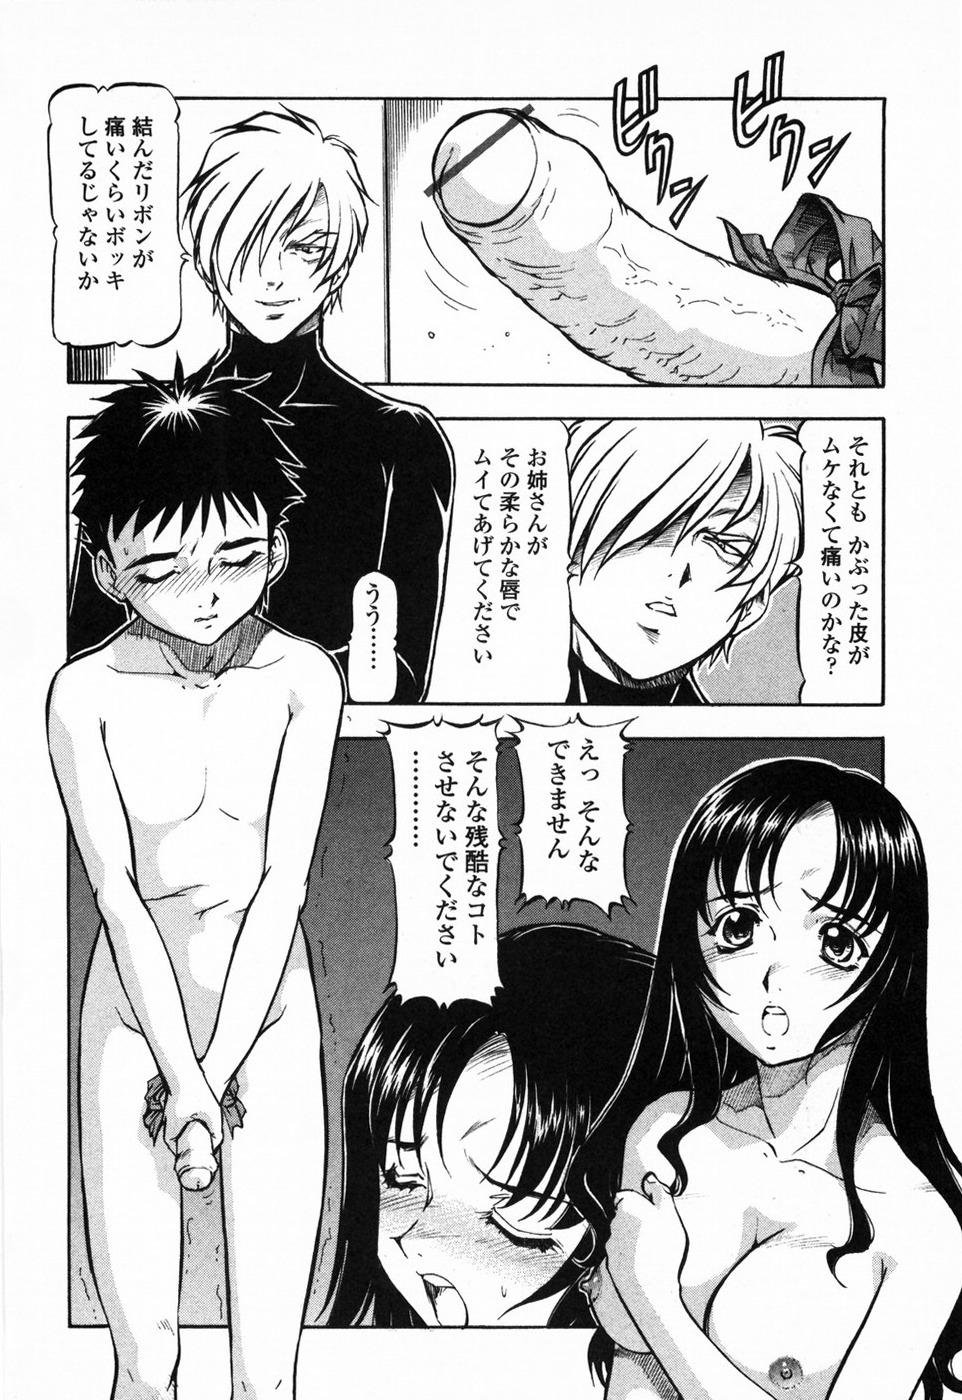 Kichiku Houteishiki - Equation of brutal person 93